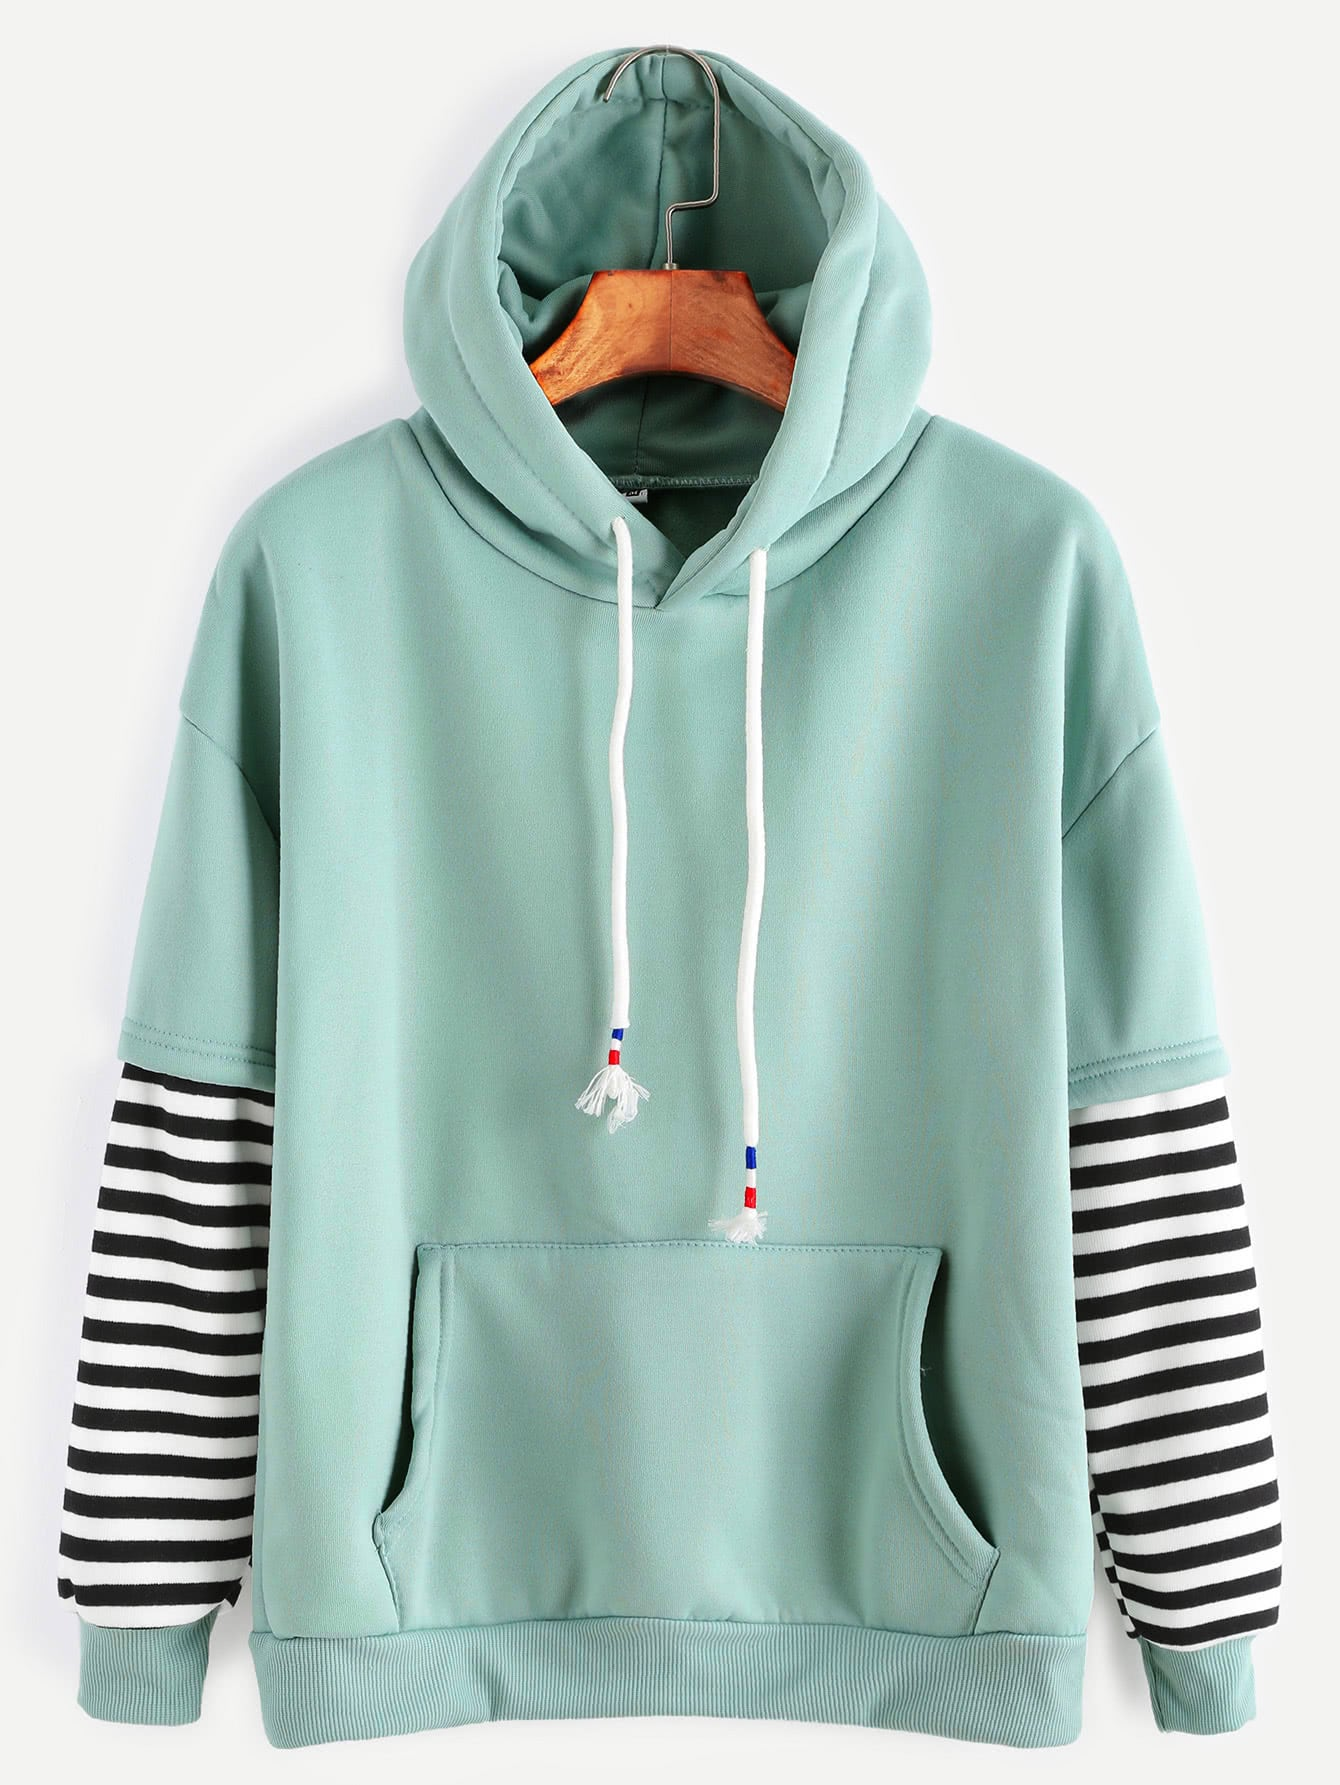 Sleeve Striped Drawstring Hooded Sweatshirt With Pocket alien print drop shoulder hooded drawstring sweatshirt